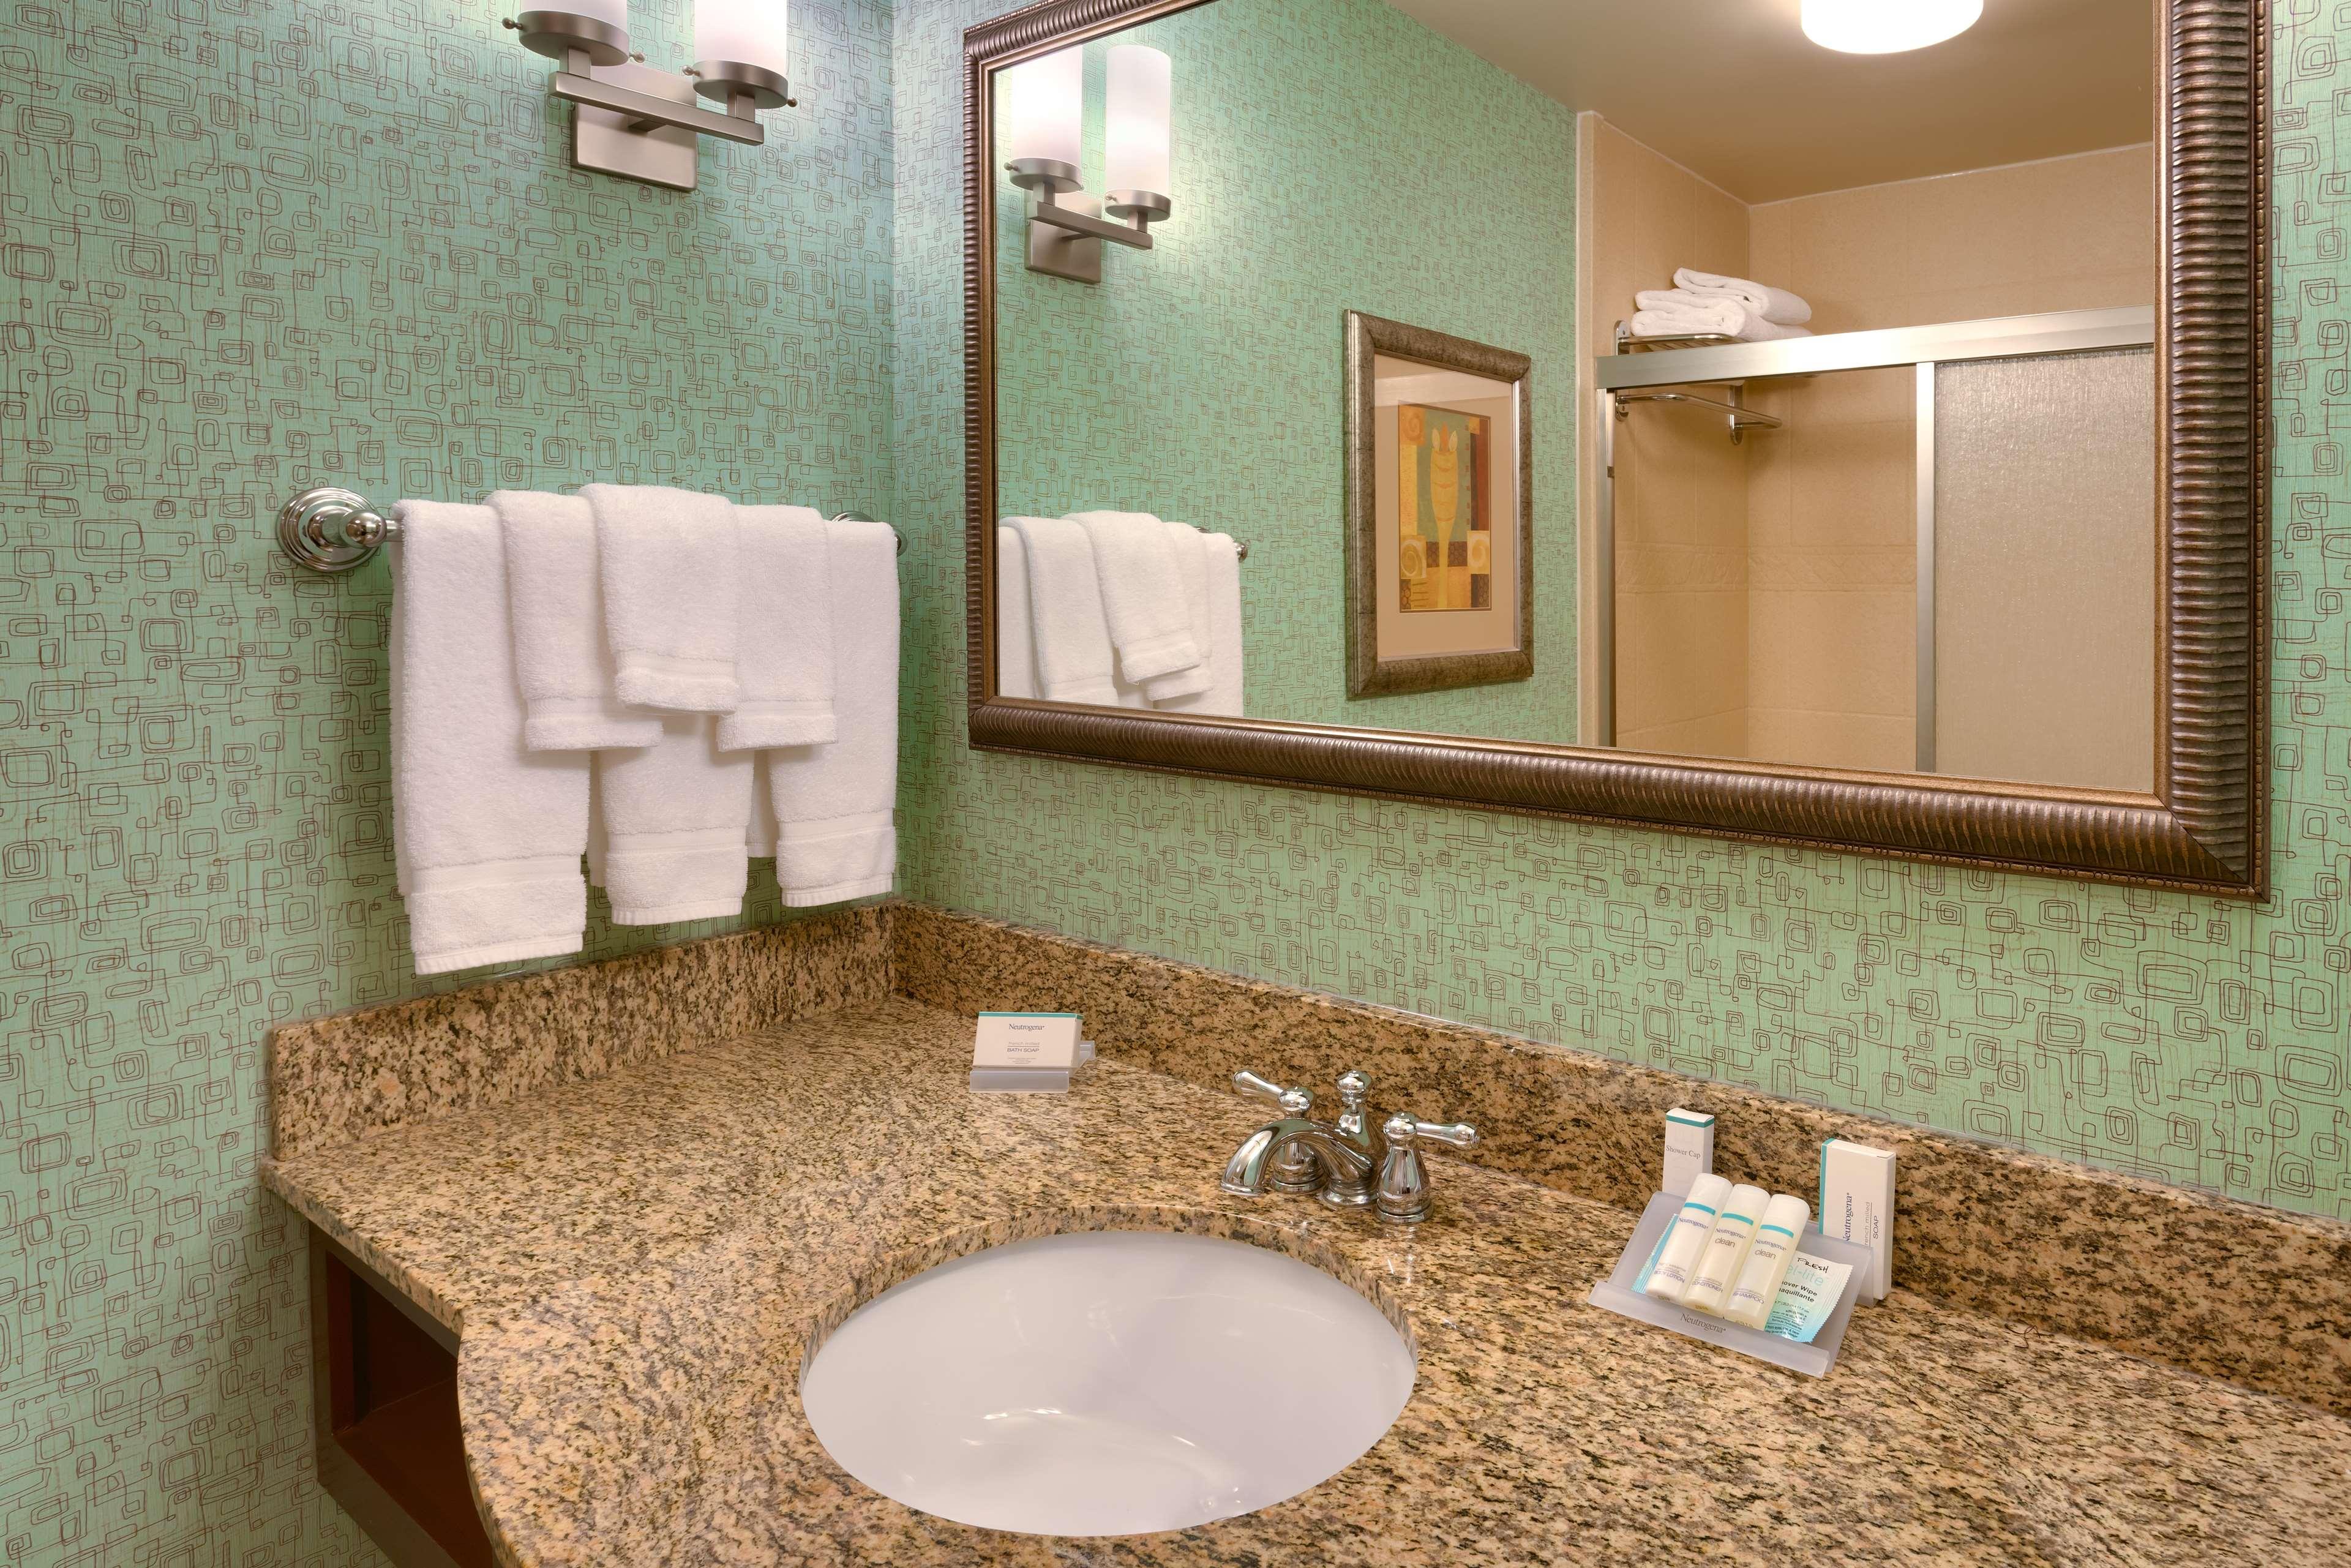 Hilton Garden Inn Clarksville image 24